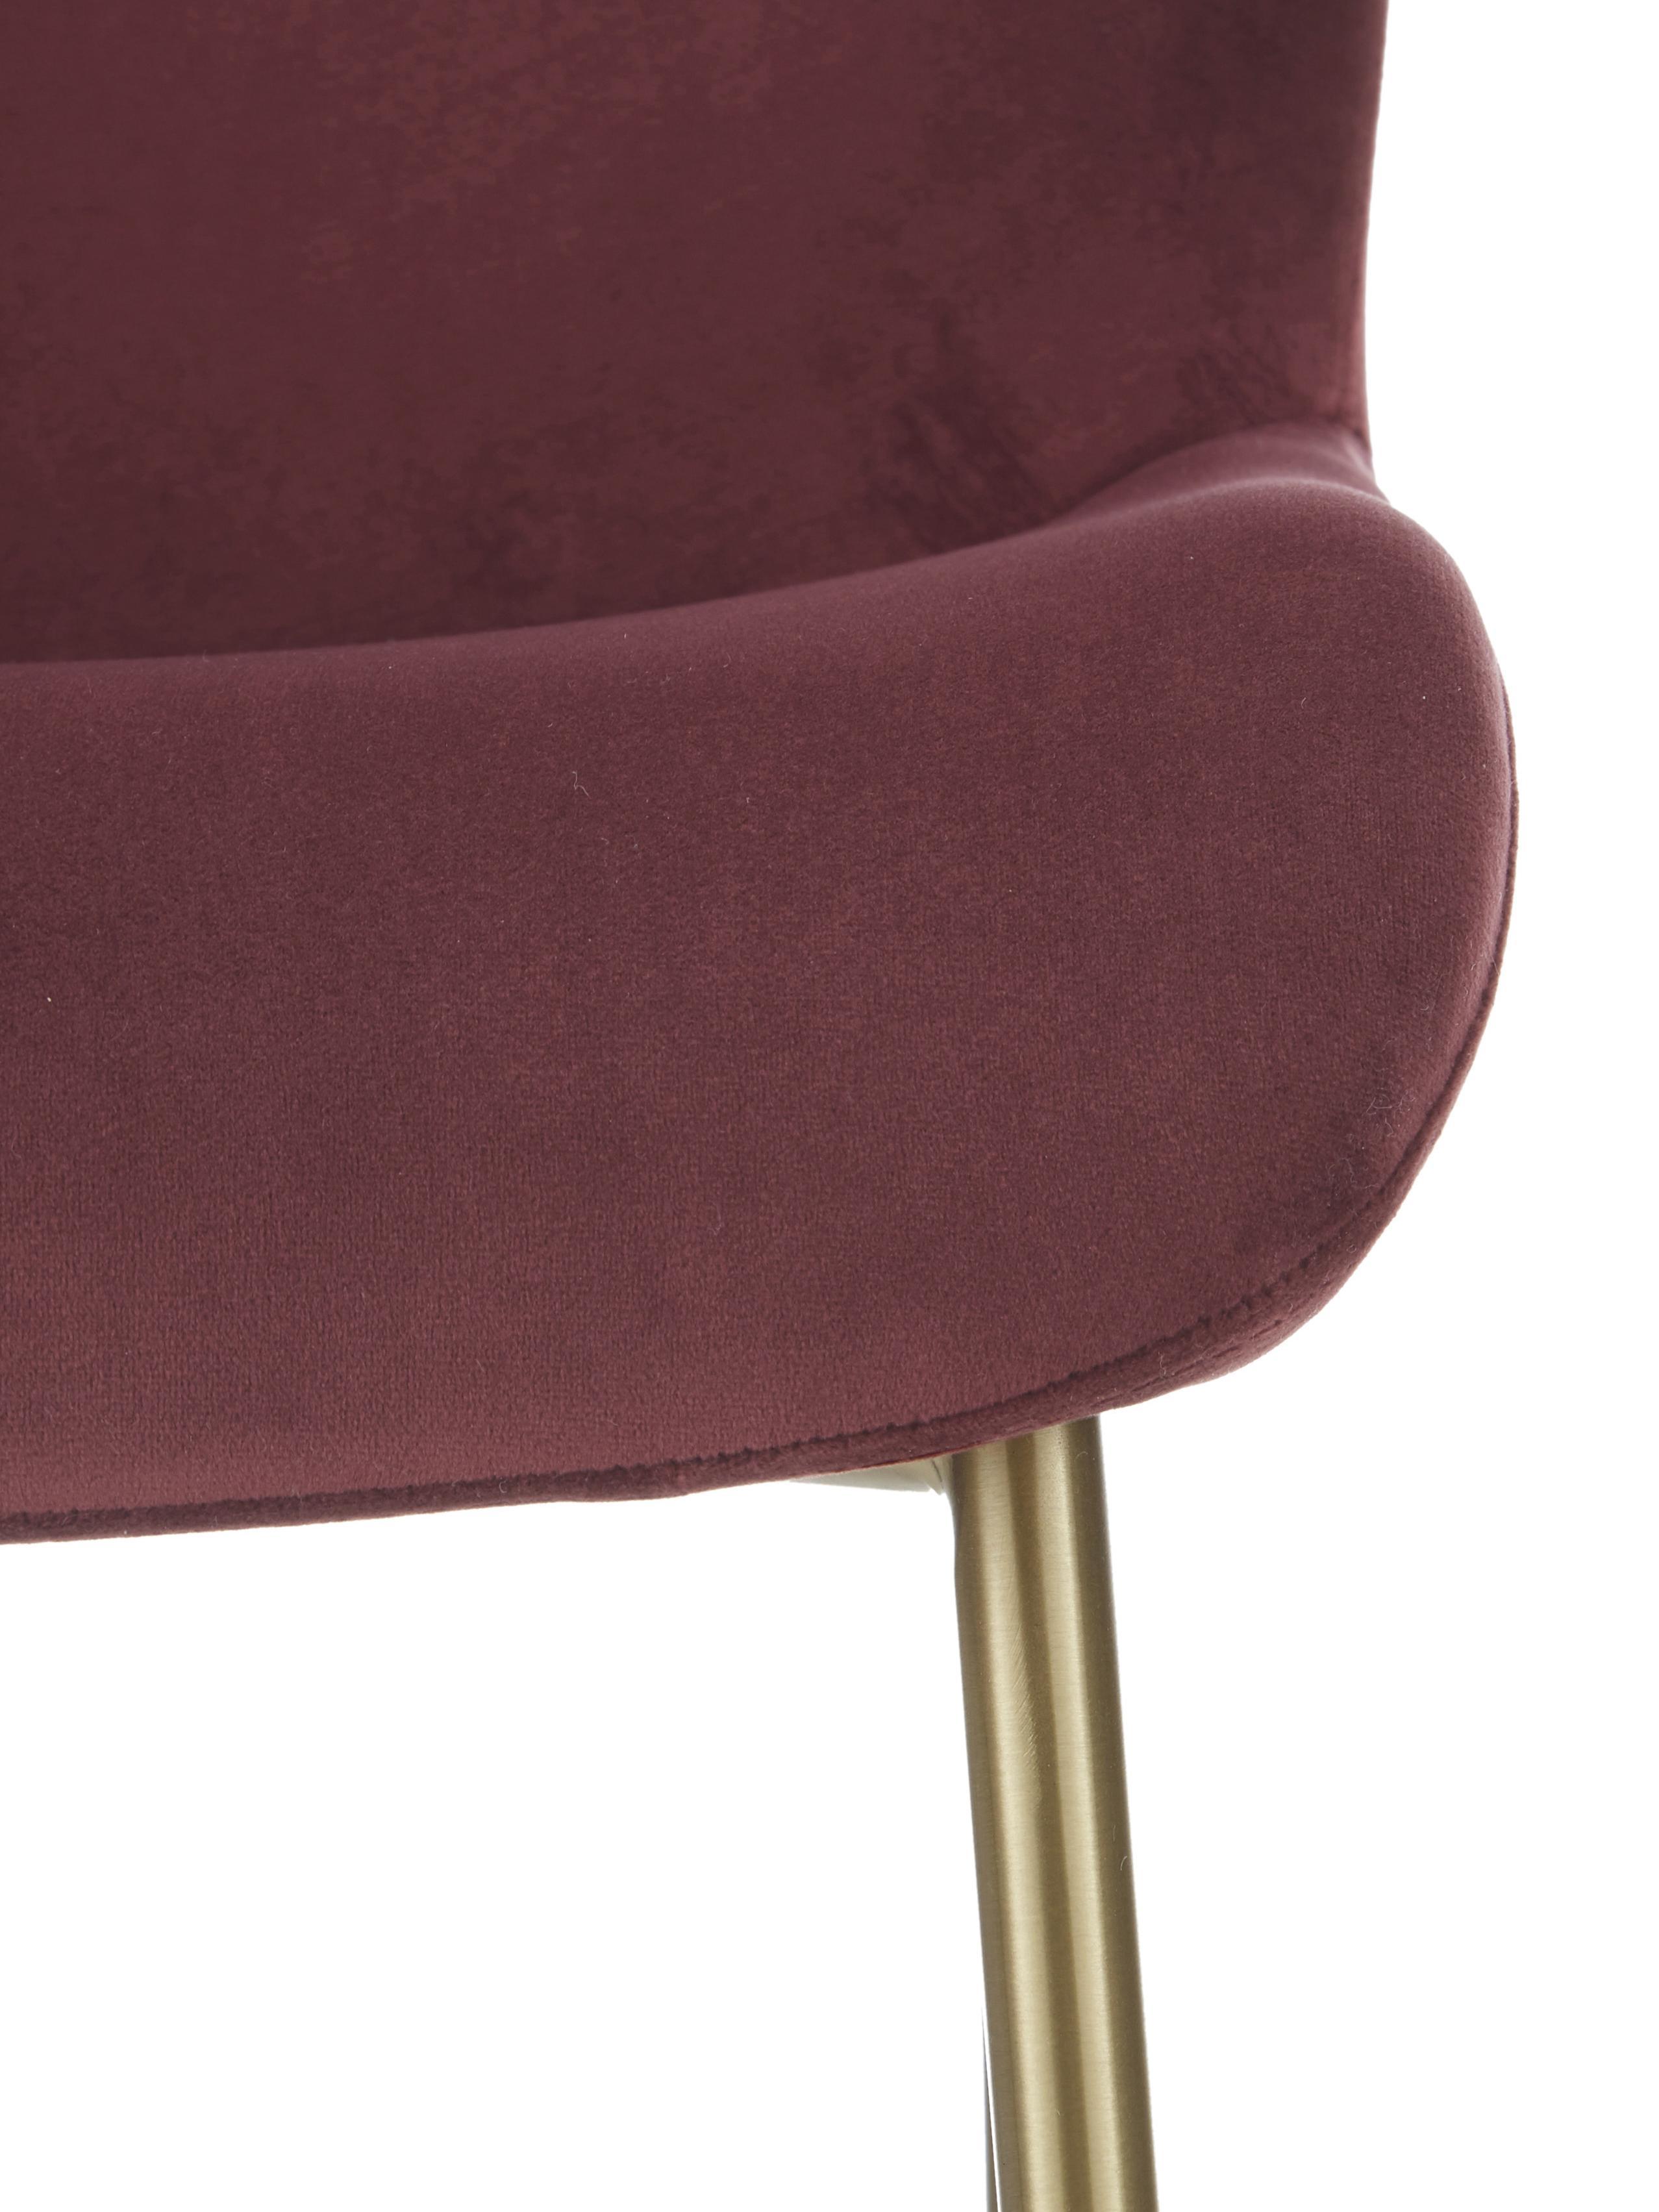 Samt-Polsterstuhl Tess, Bezug: Samt (Polyester) 30.000 S, Beine: Metall, beschichtet, Samt Bordeaux, Beine Gold, B 48 x T 64 cm